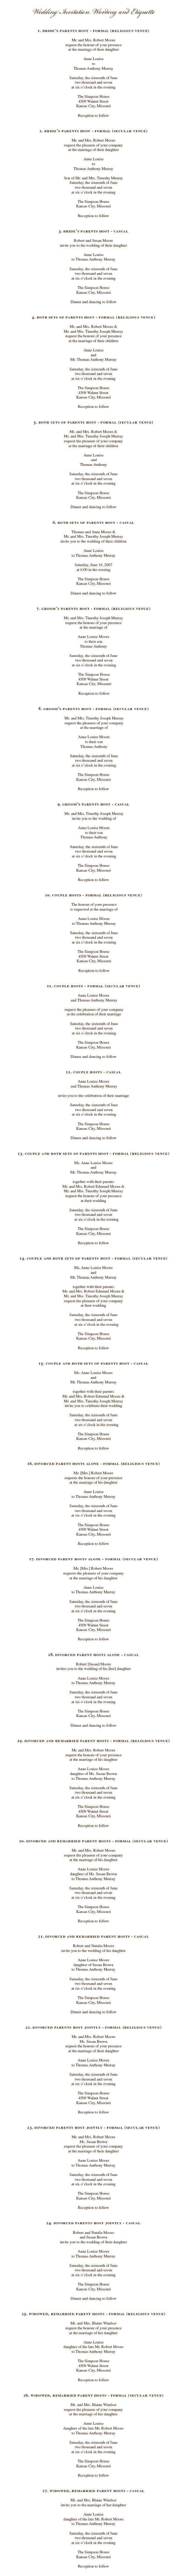 Wedding Invitation Wording and Etiquette   Invitations   Pinterest ...